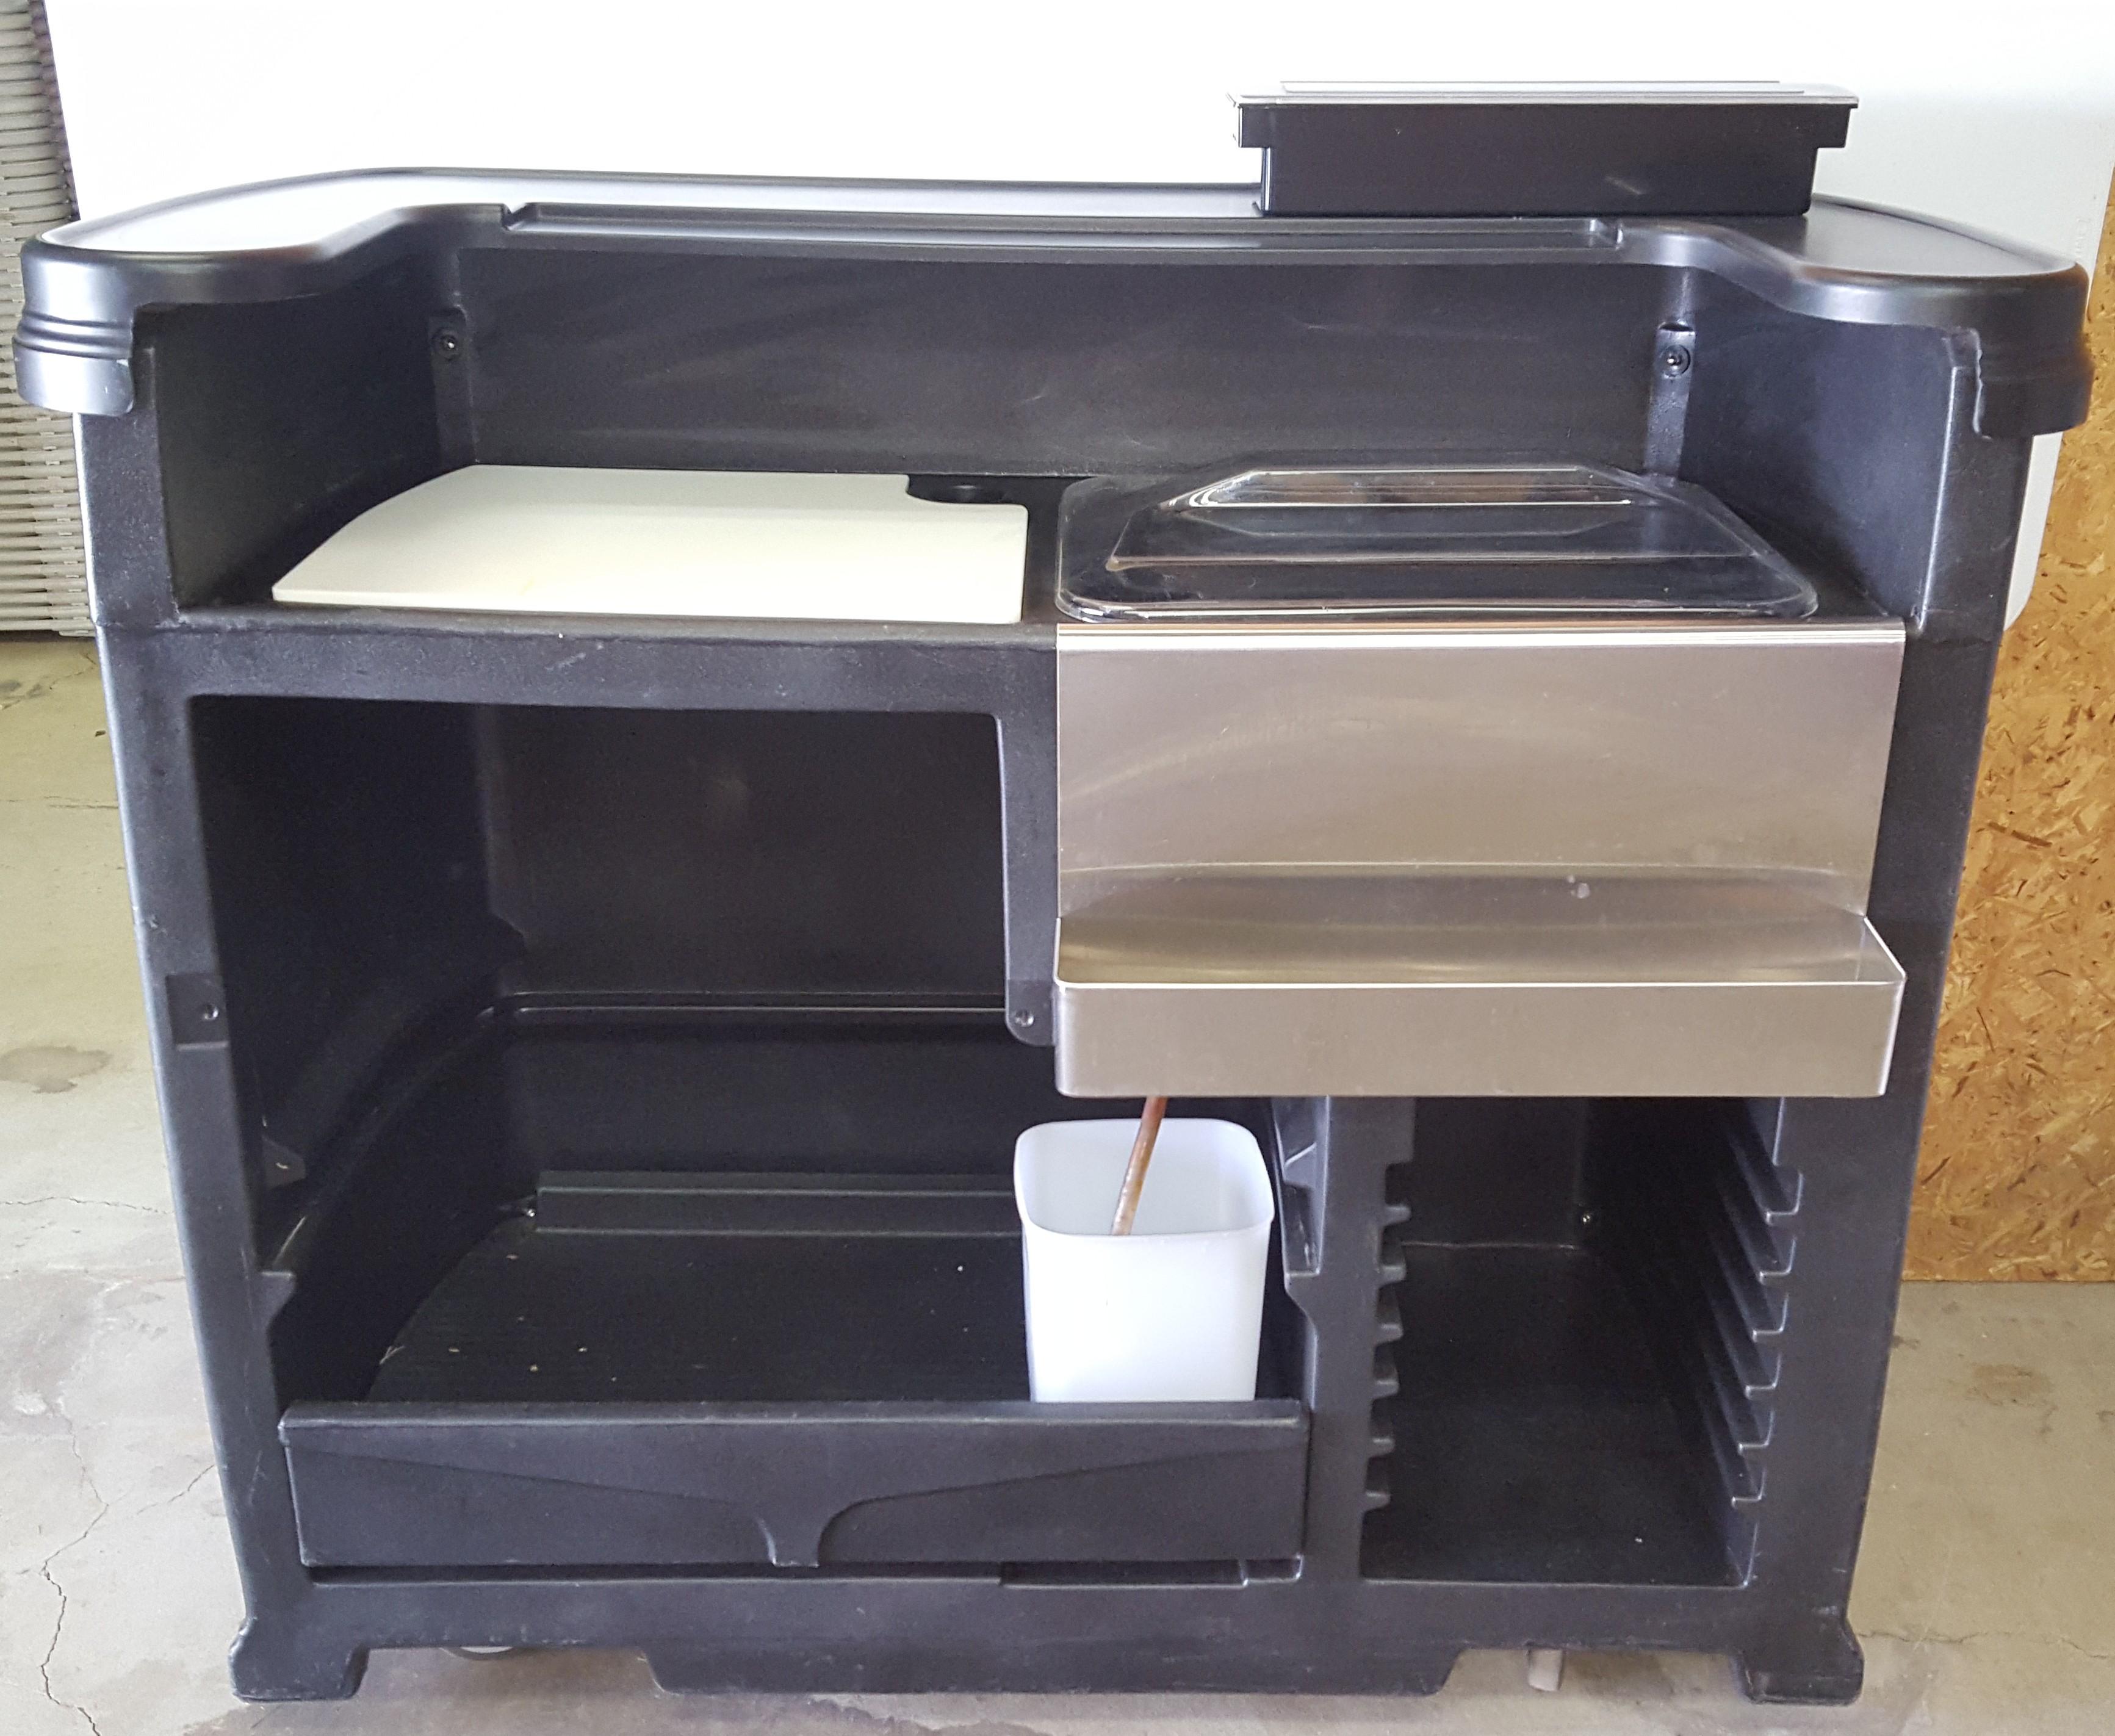 Garbage cans coolers sidewalls keg coolers generators for Porta john rental